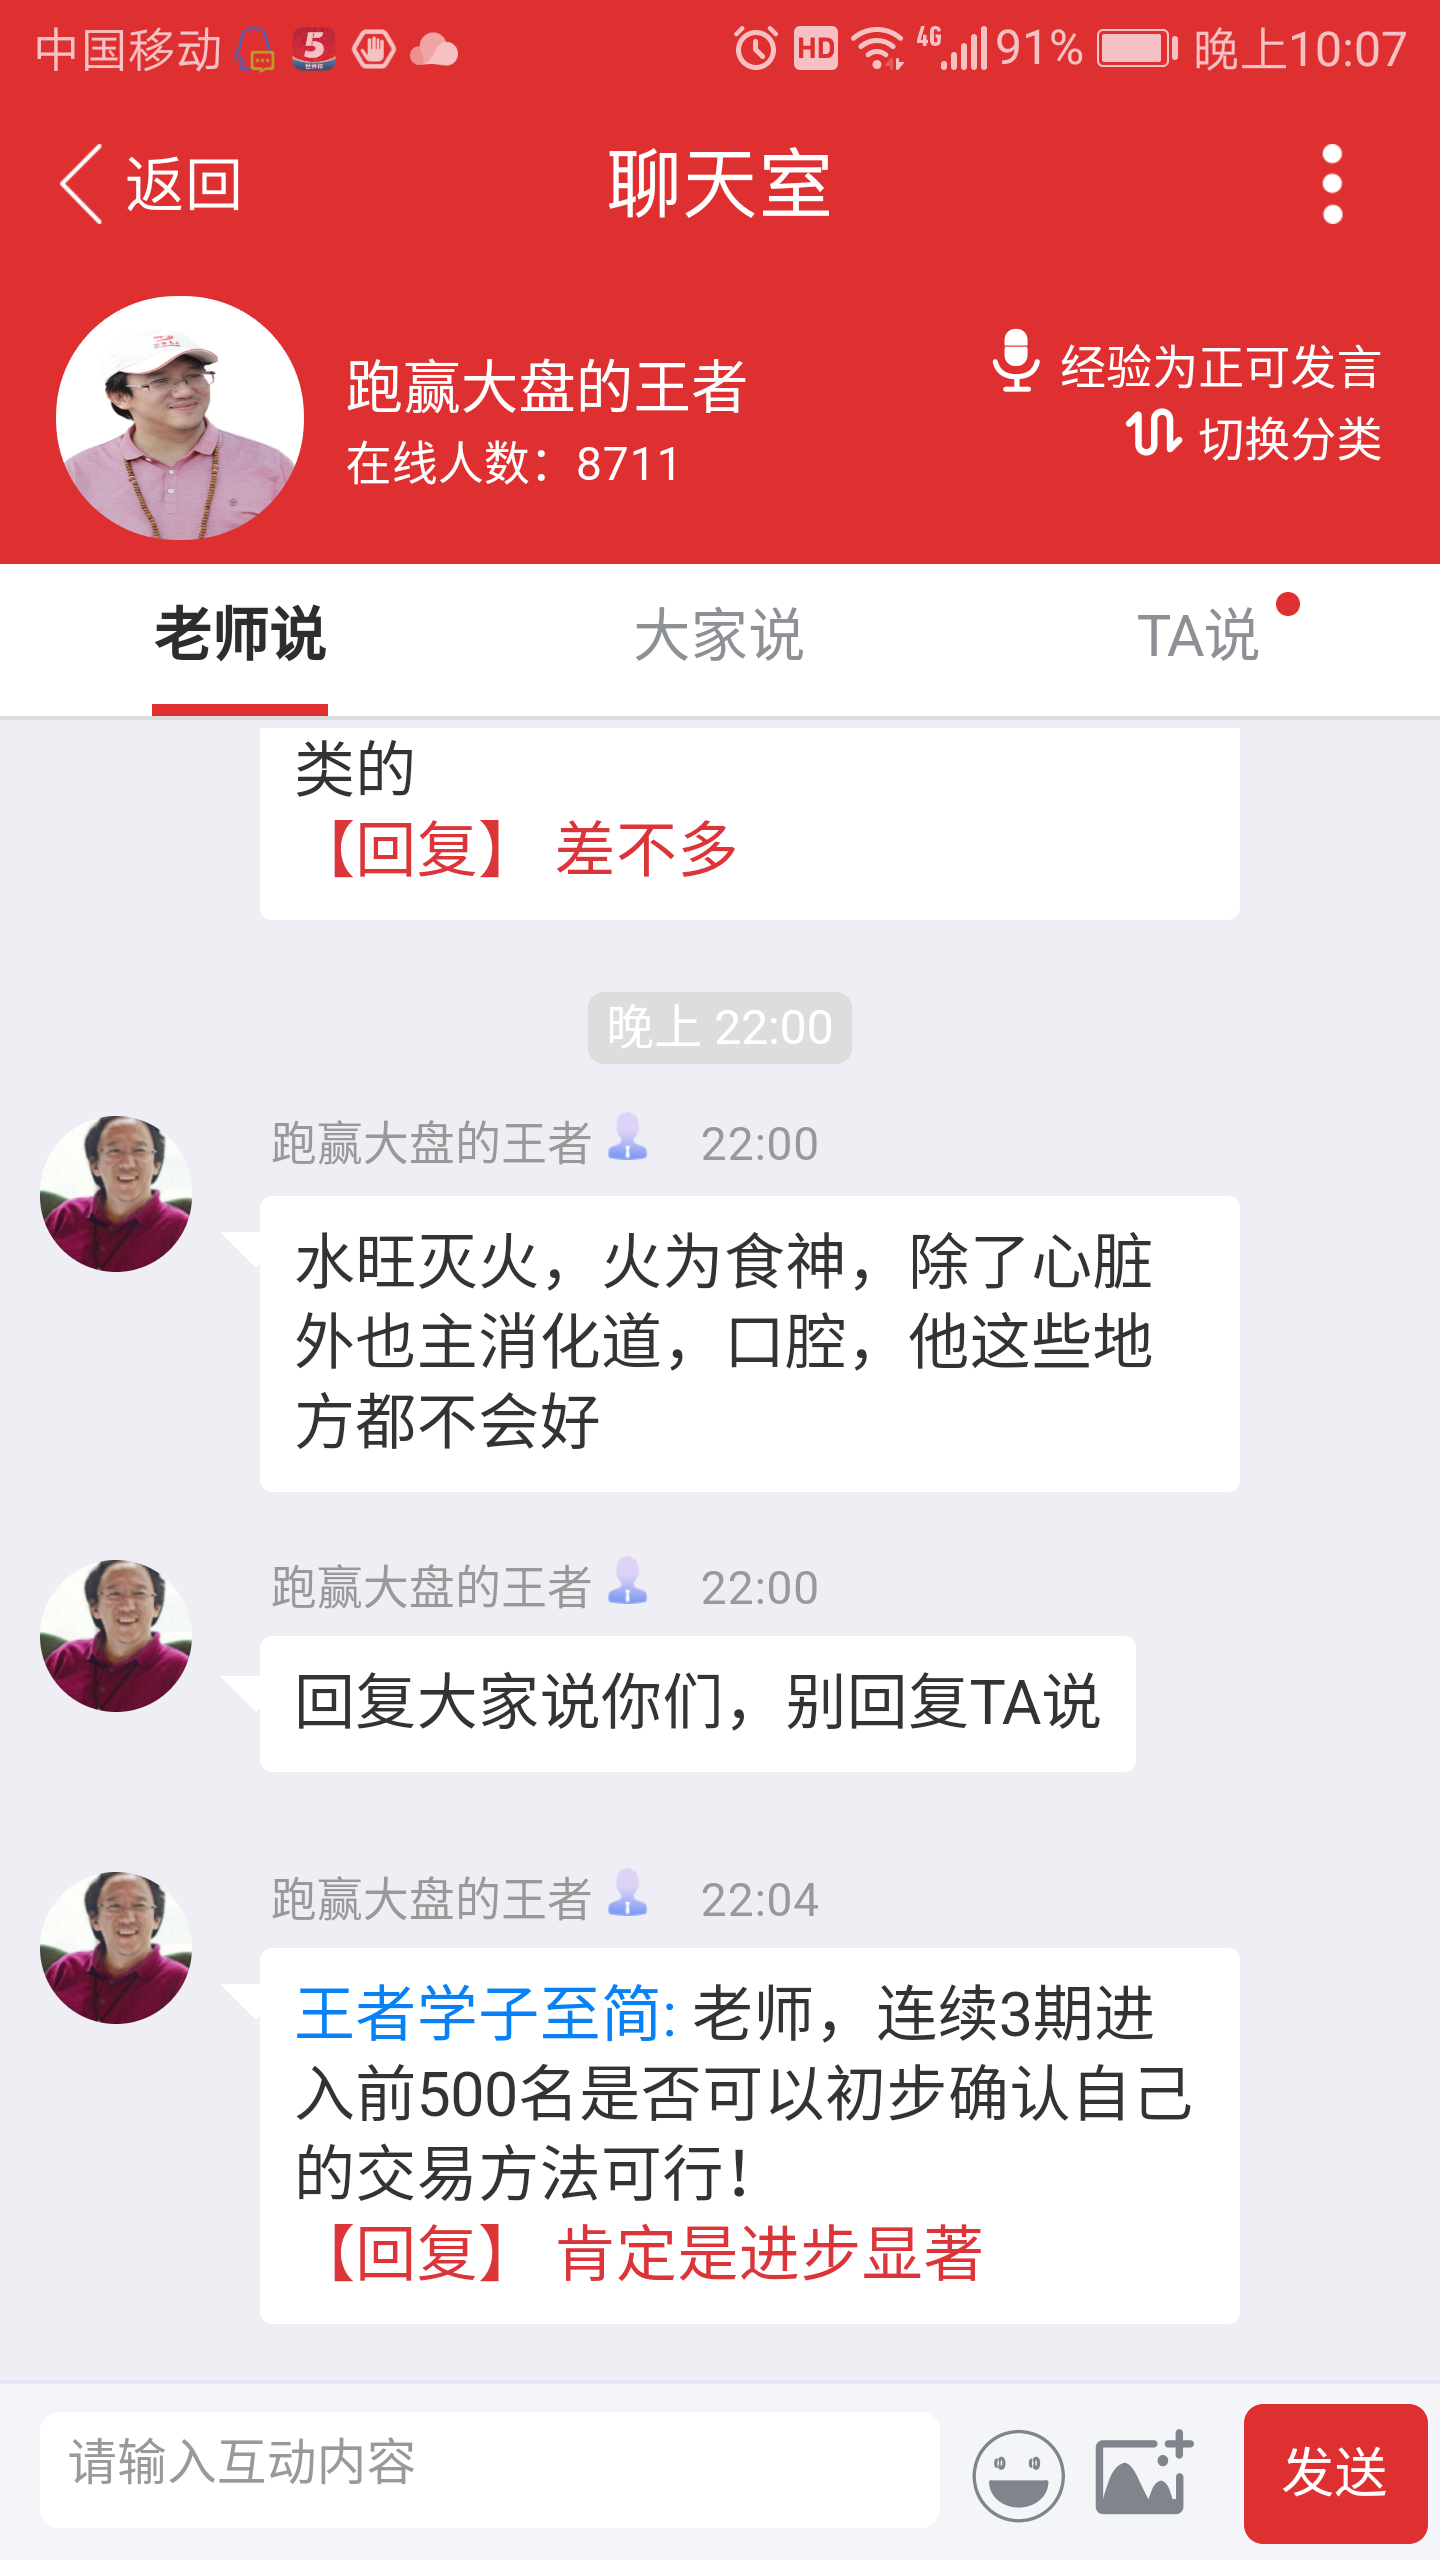 Screenshot_20180708-220711.png